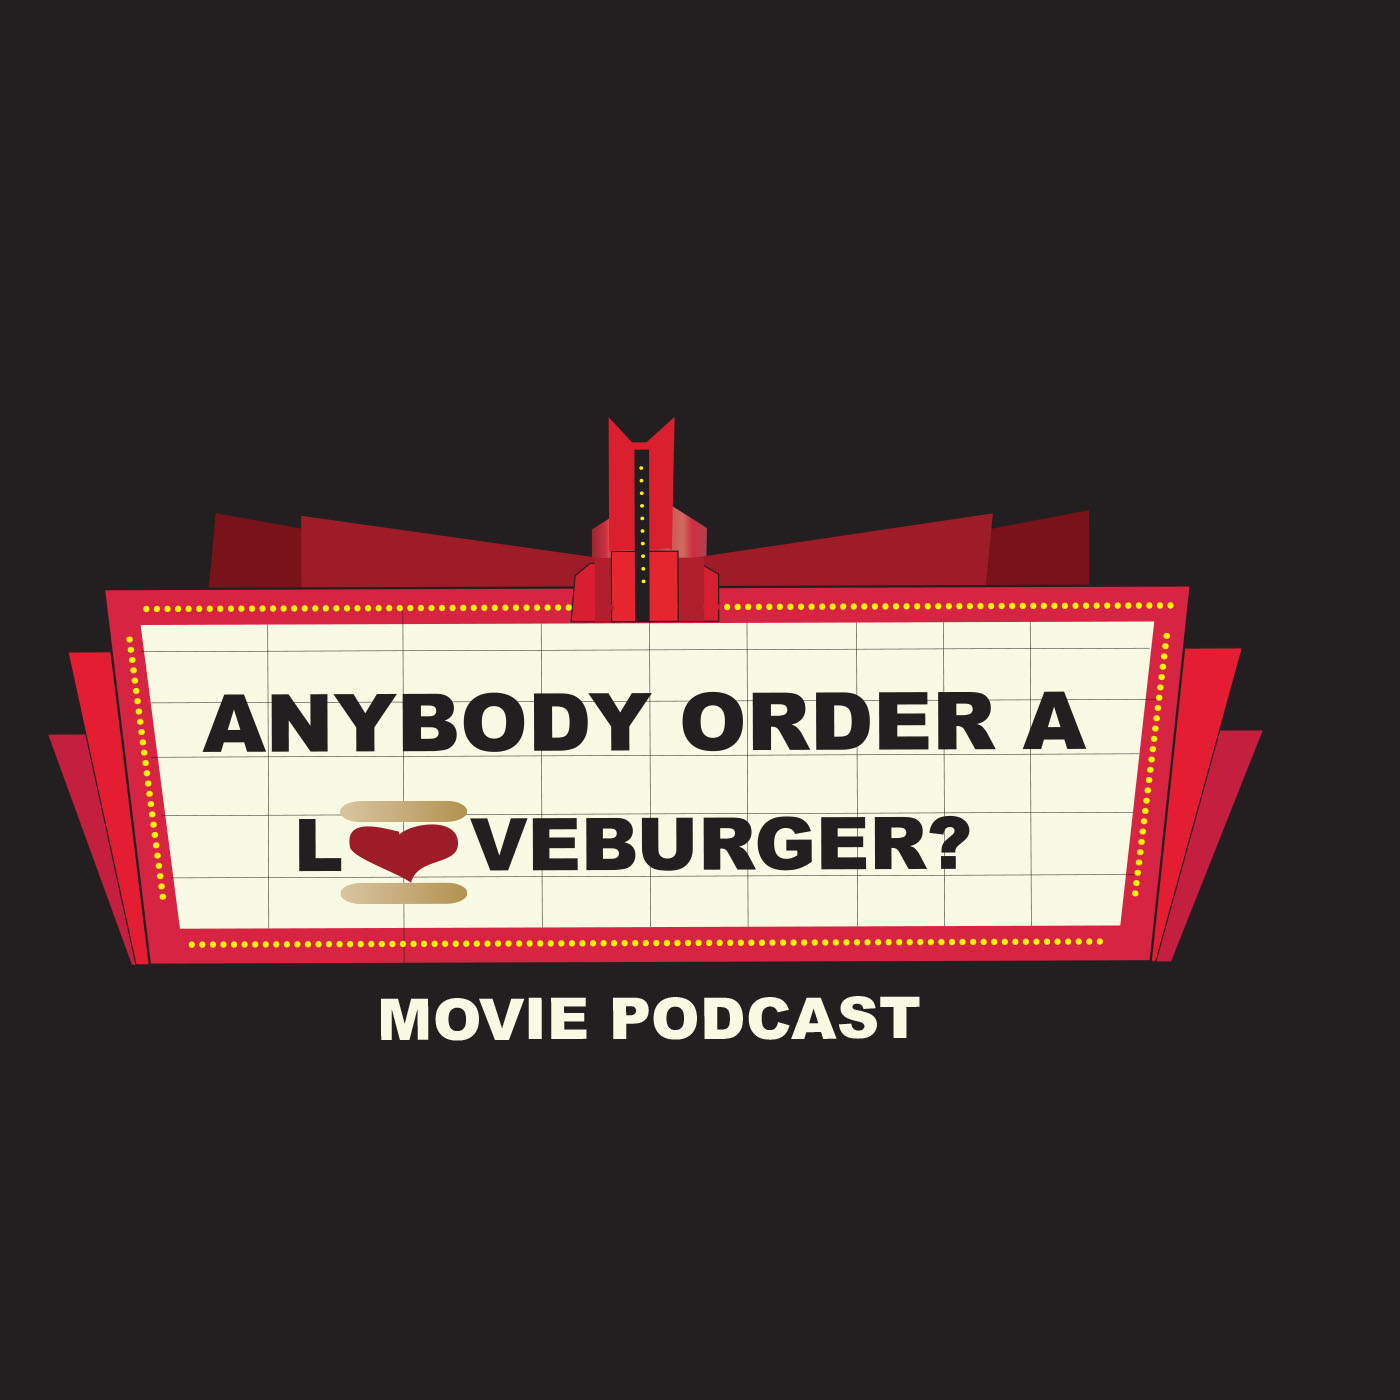 Anybody Order A Loveburger? Movie Podcast show art